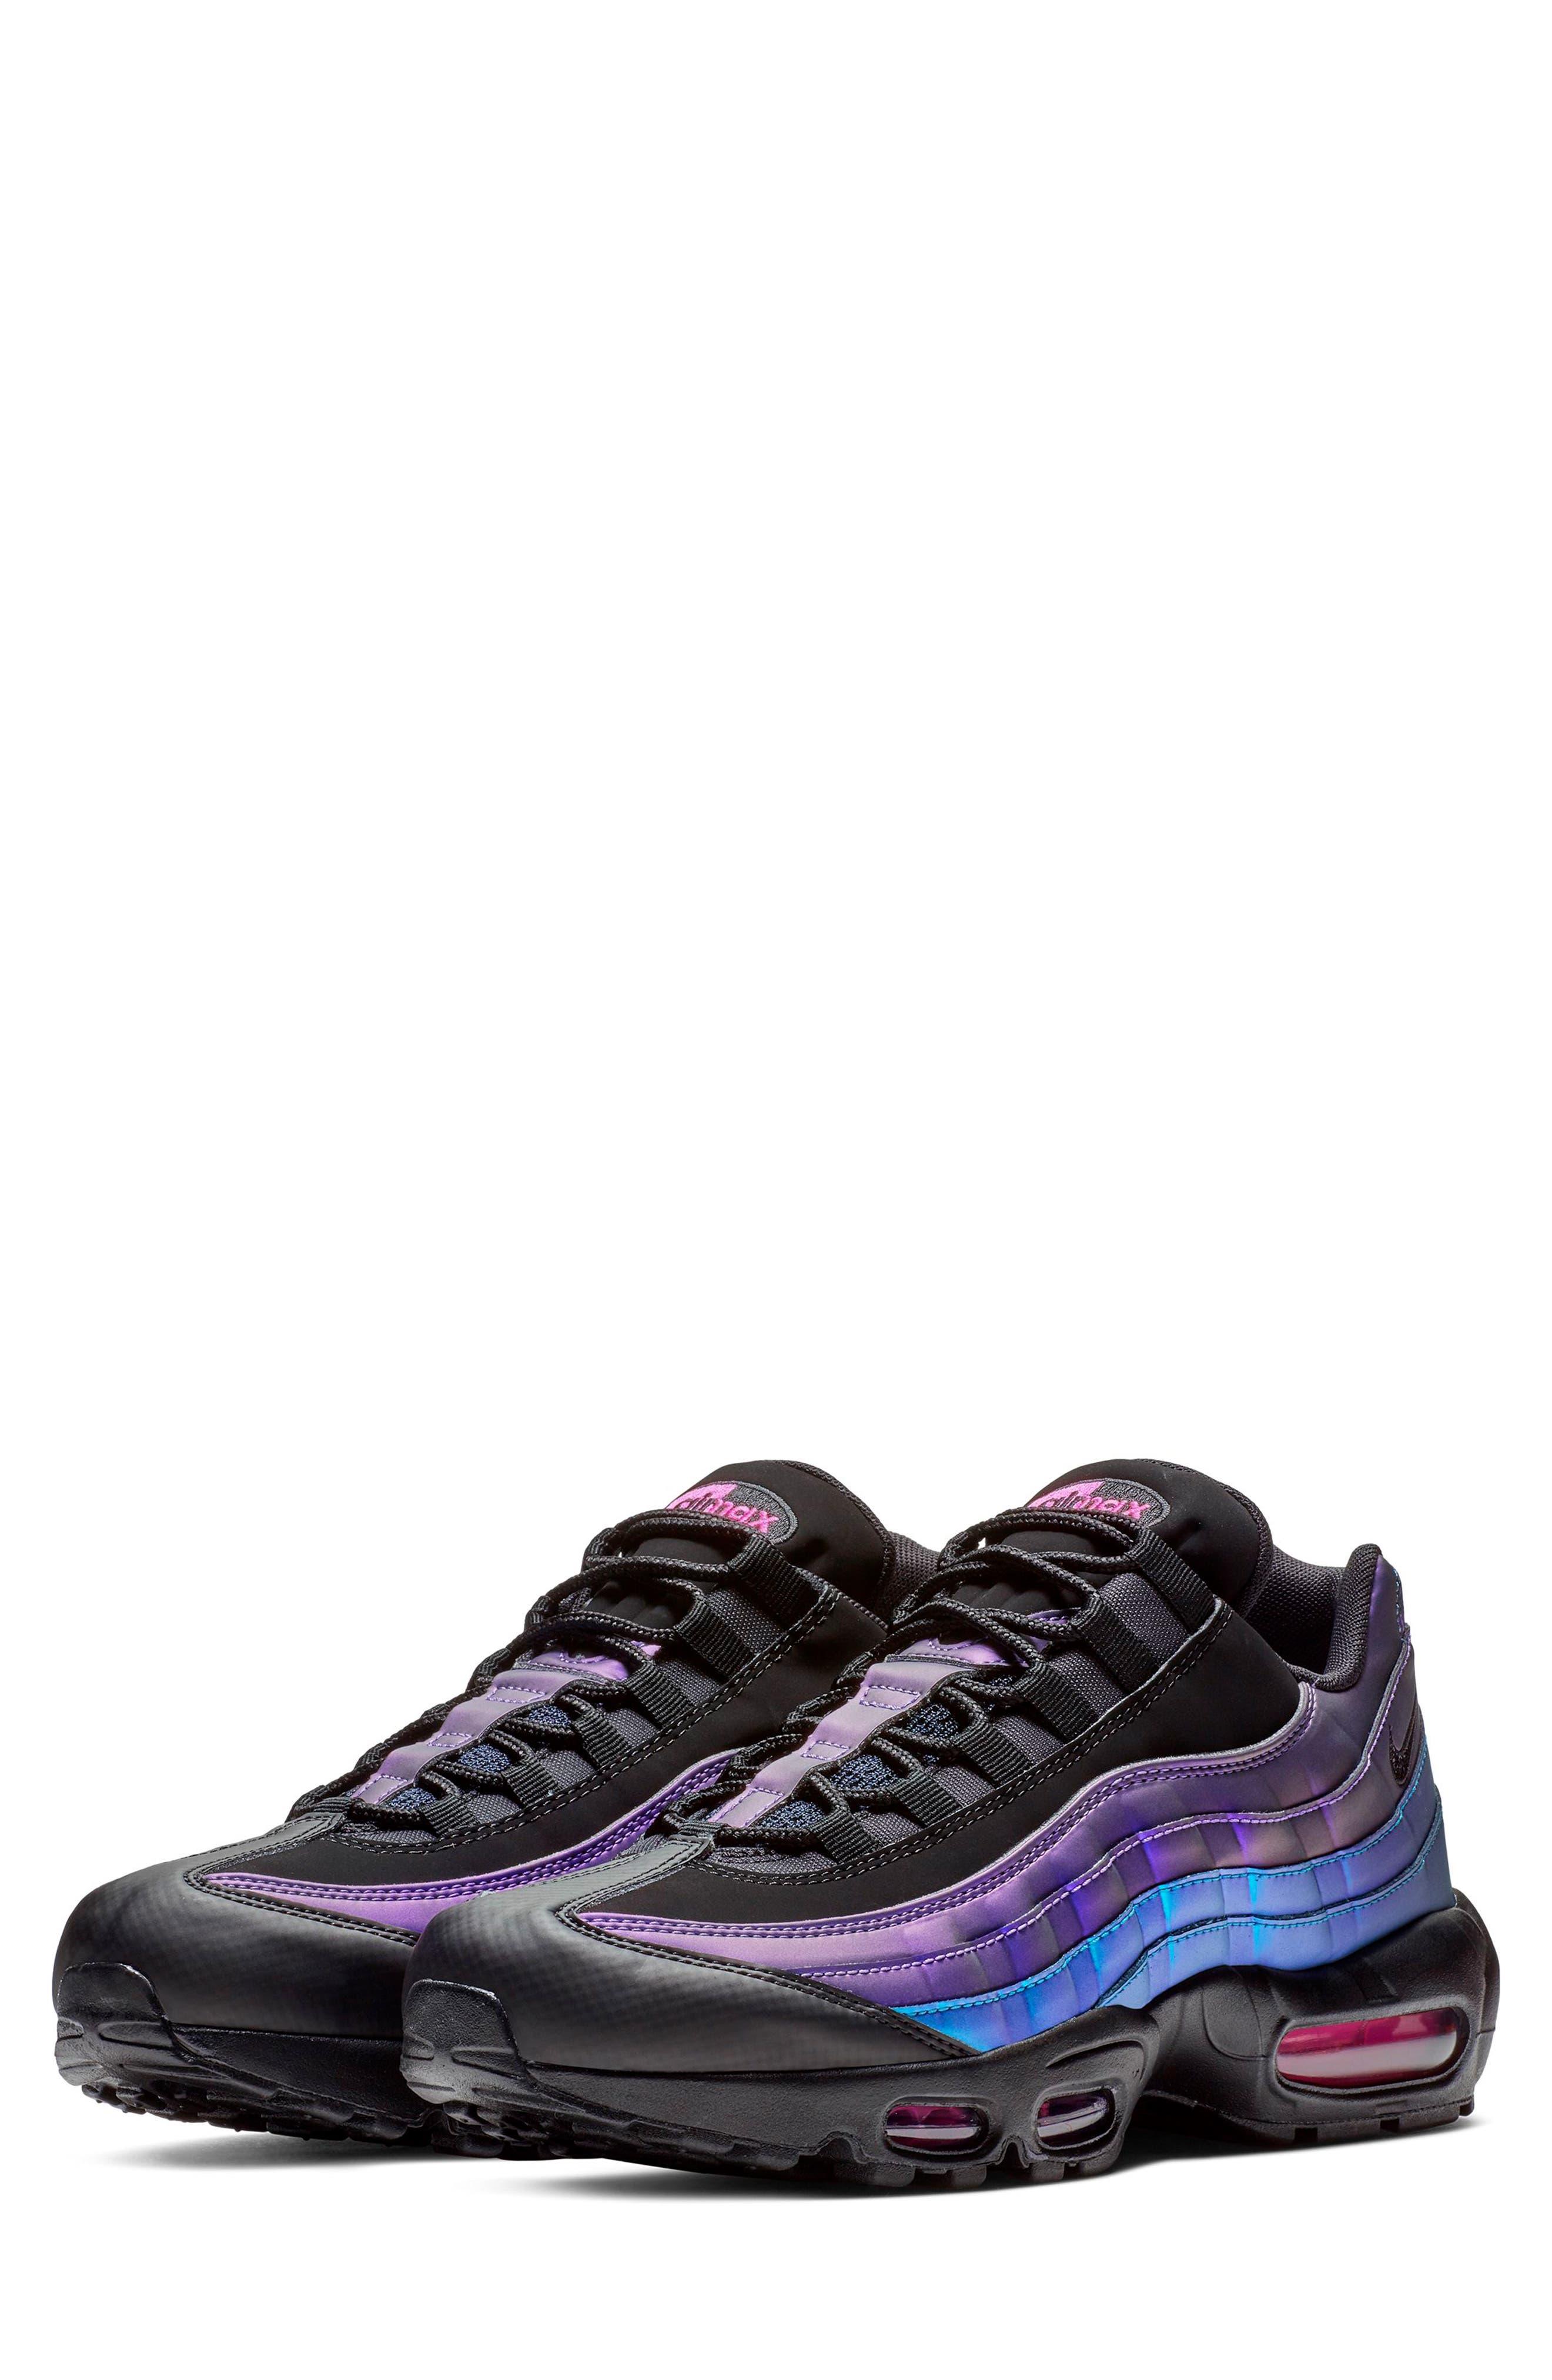 save off 461d1 527b2 Men s Nordstrom x Nike Sneakers   Nordstrom